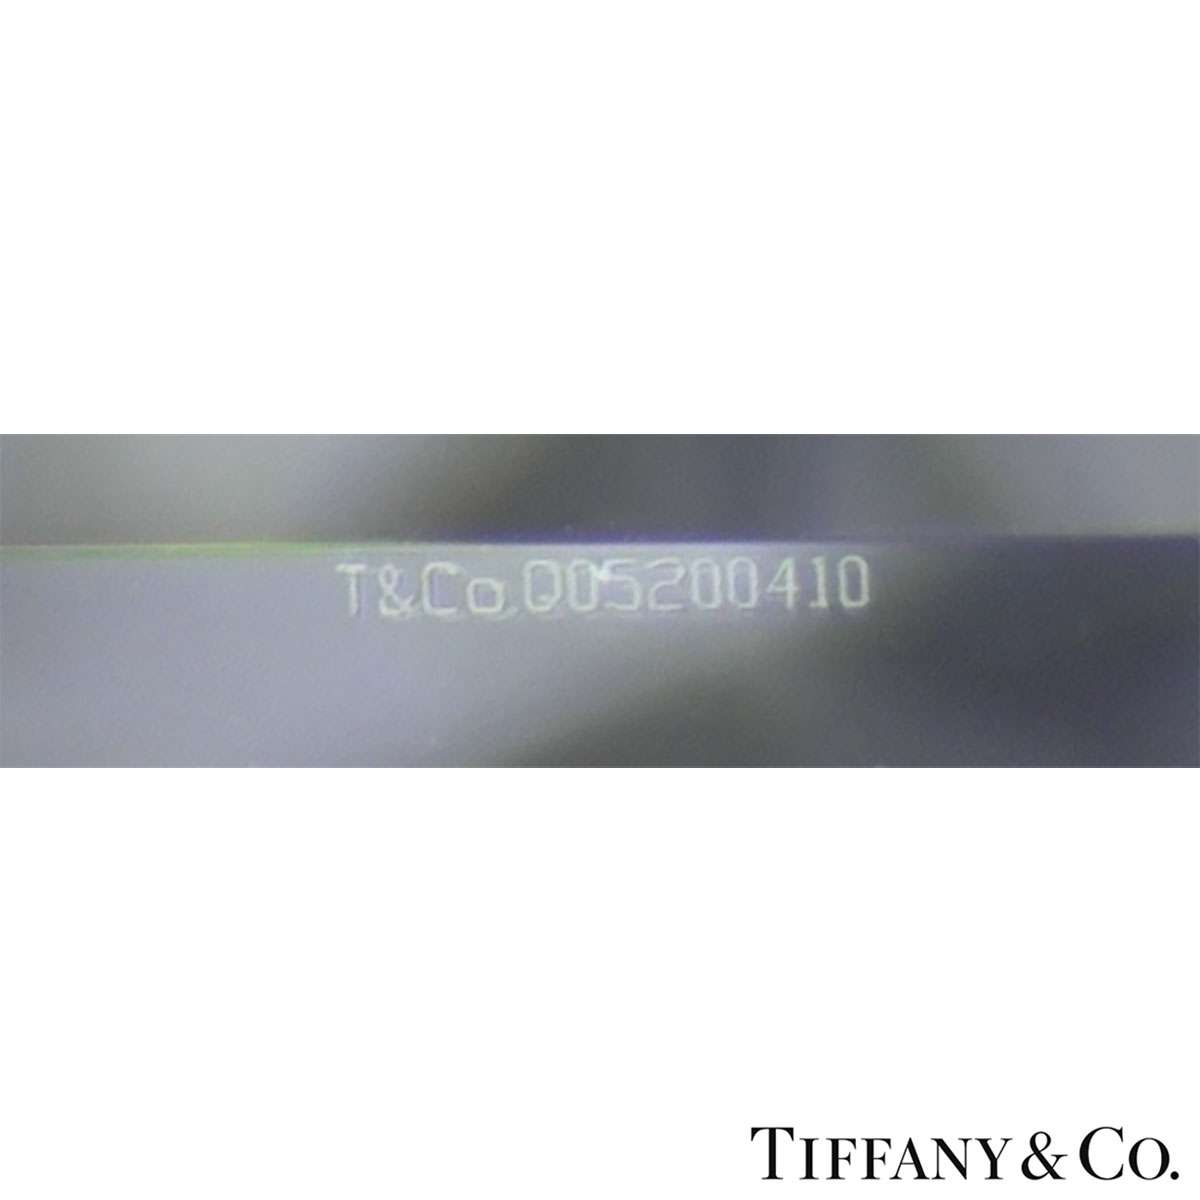 Tiffany & Co. Round Brilliant Cut Diamond Ring 0.86ct H/VVS1 XXX